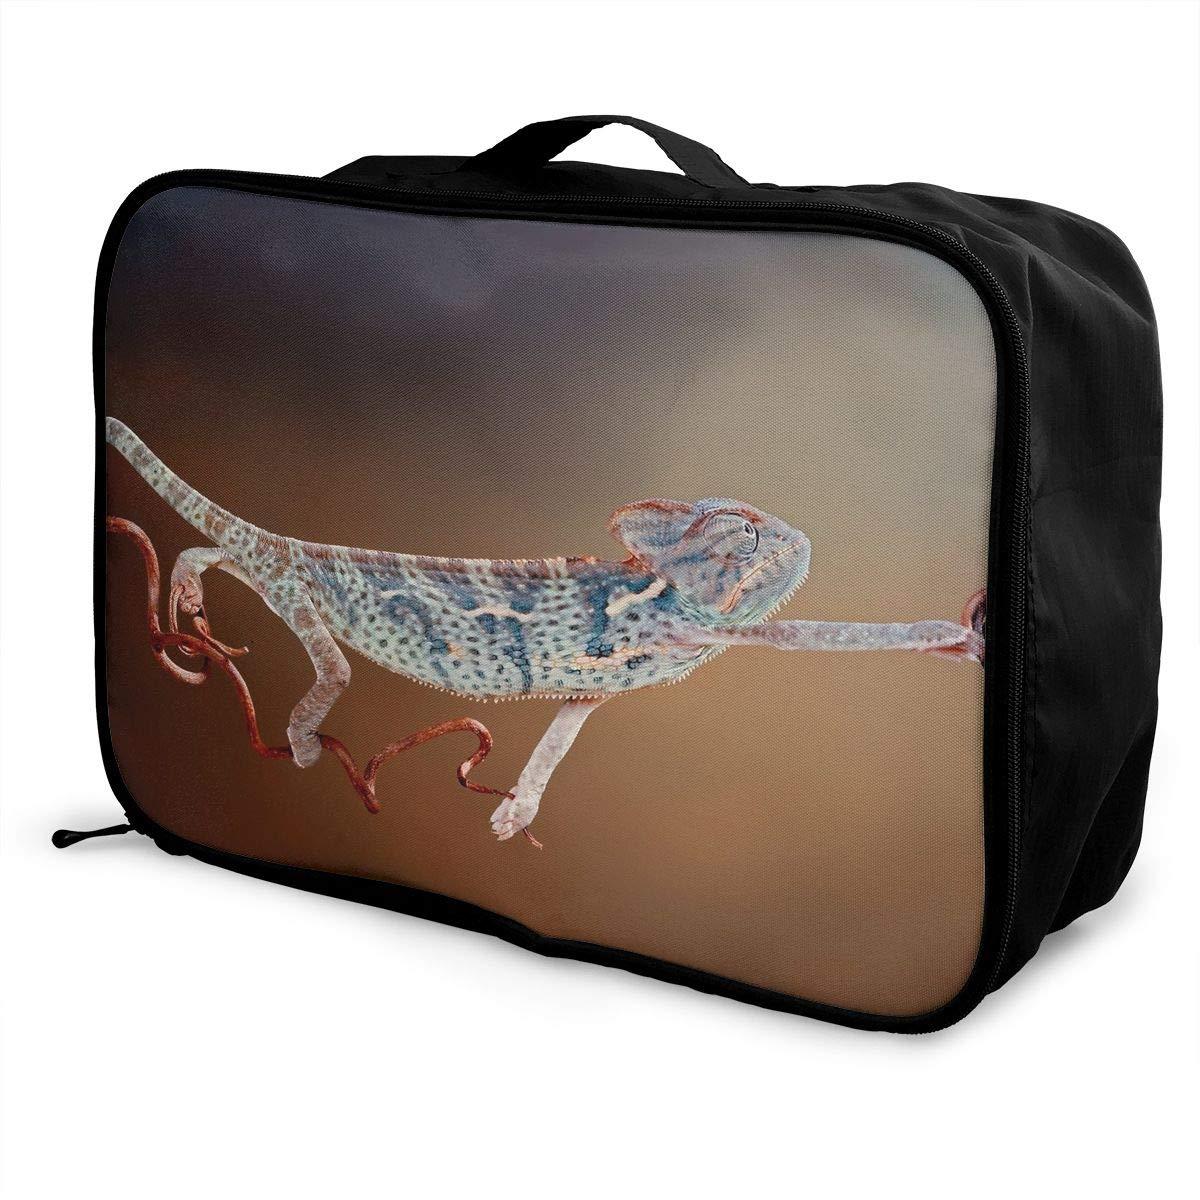 Travel Luggage Duffle Bag Lightweight Portable Handbag Gecko Print Large Capacity Waterproof Foldable Storage Tote